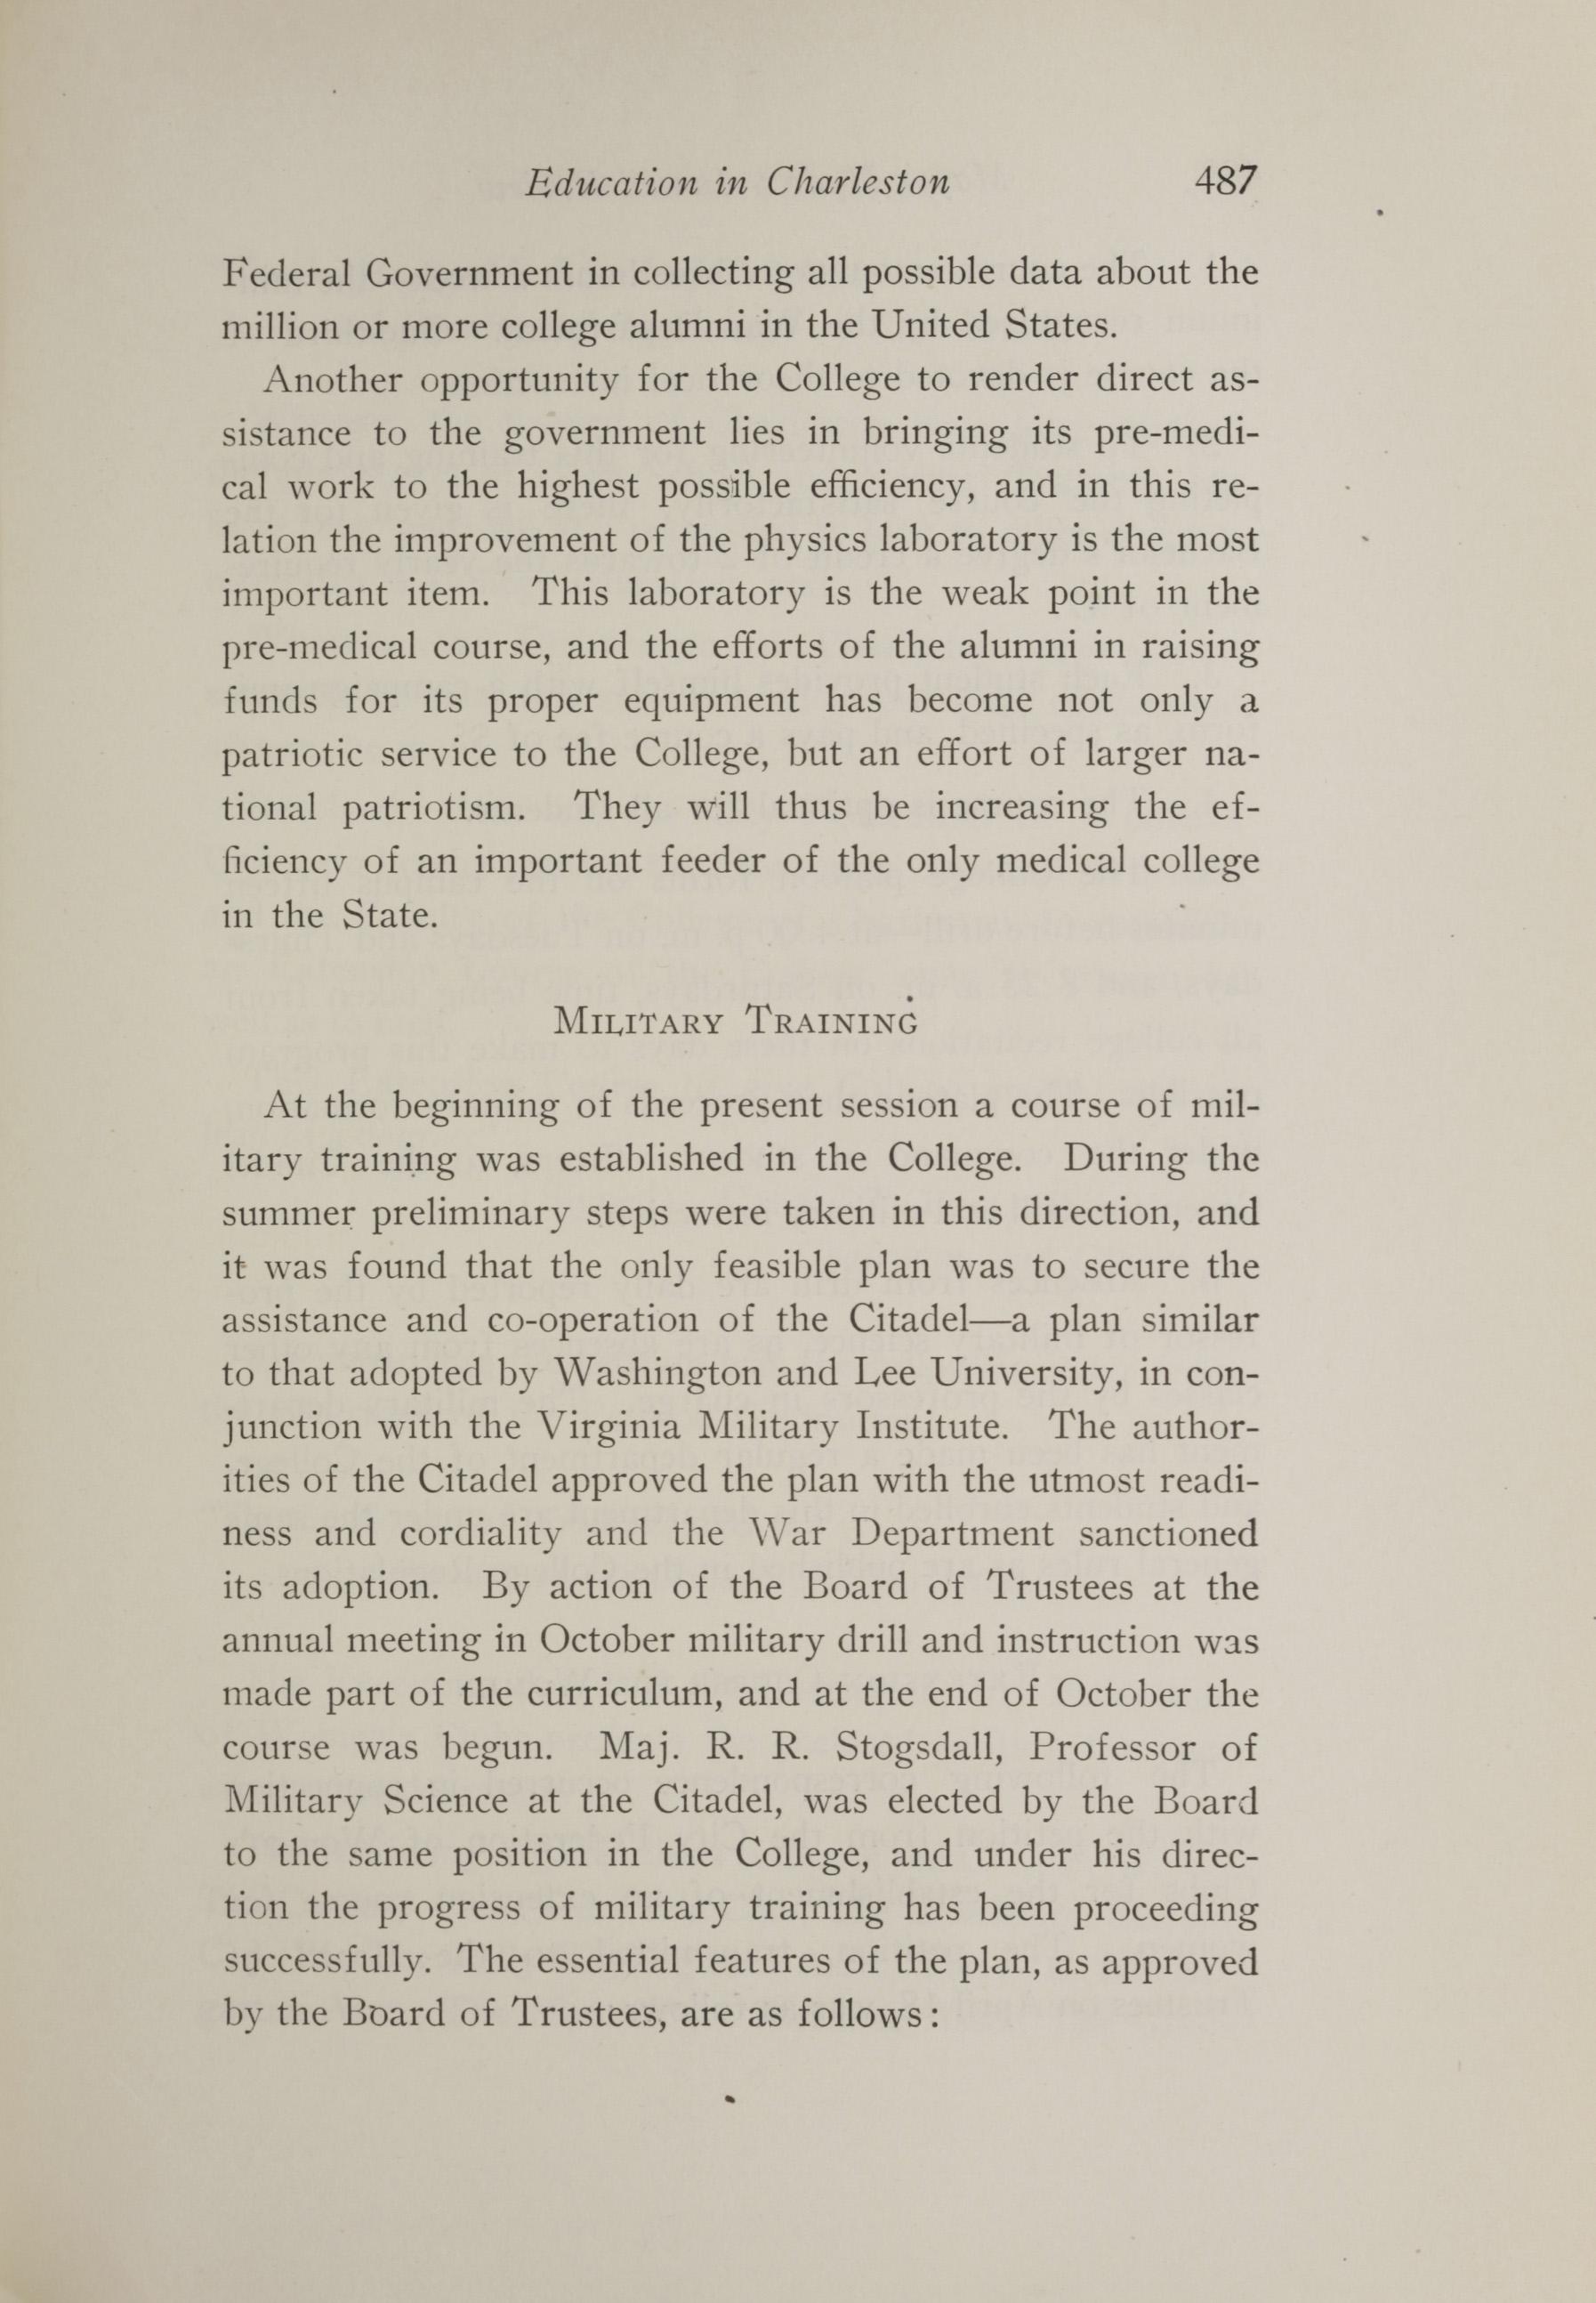 Charleston Yearbook, 1917, page 487